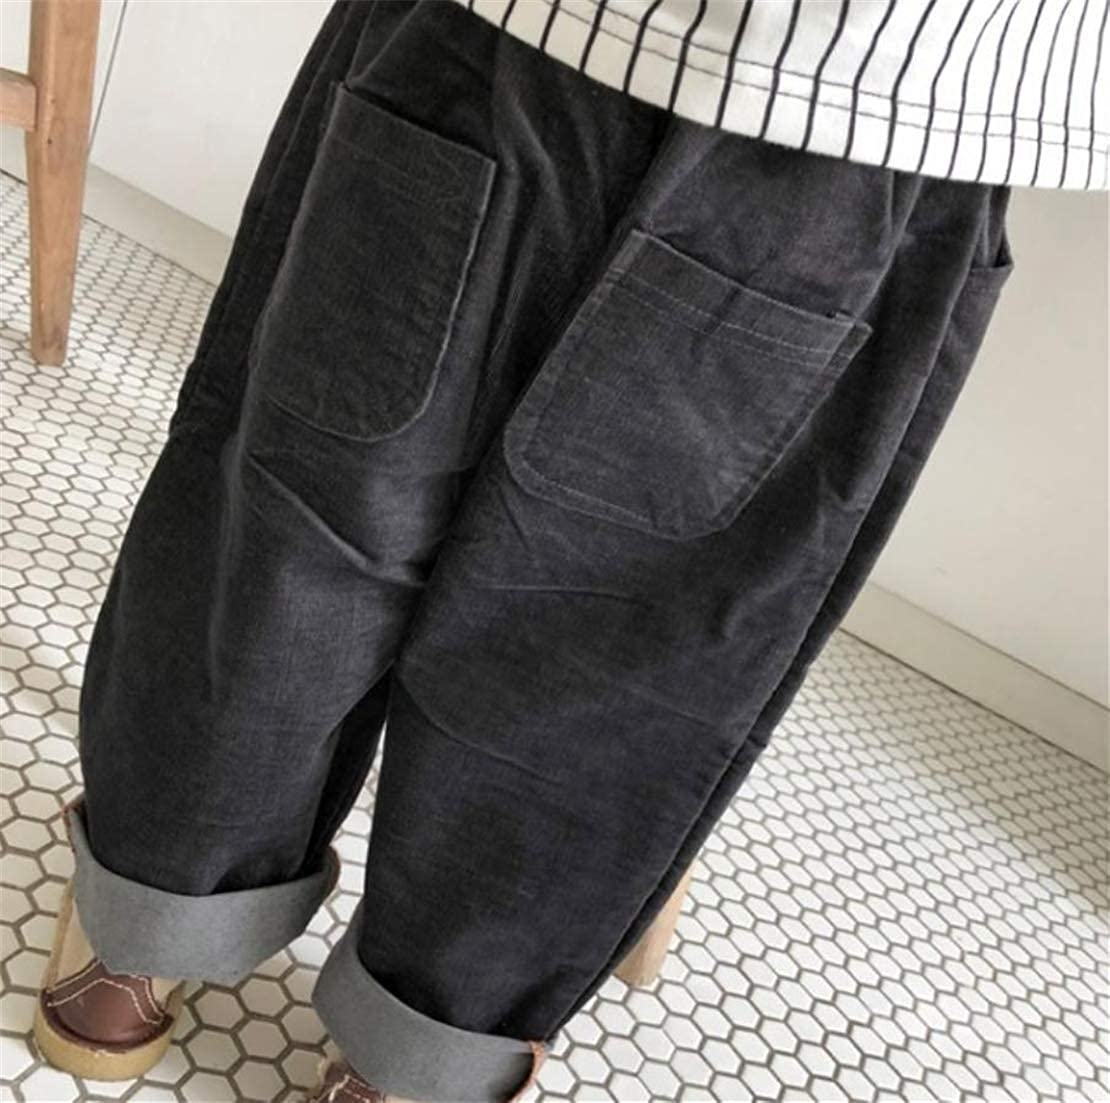 Sweatwater Boys Autumn Winter Elastic Waist Trousers Casual Corduroy Pants